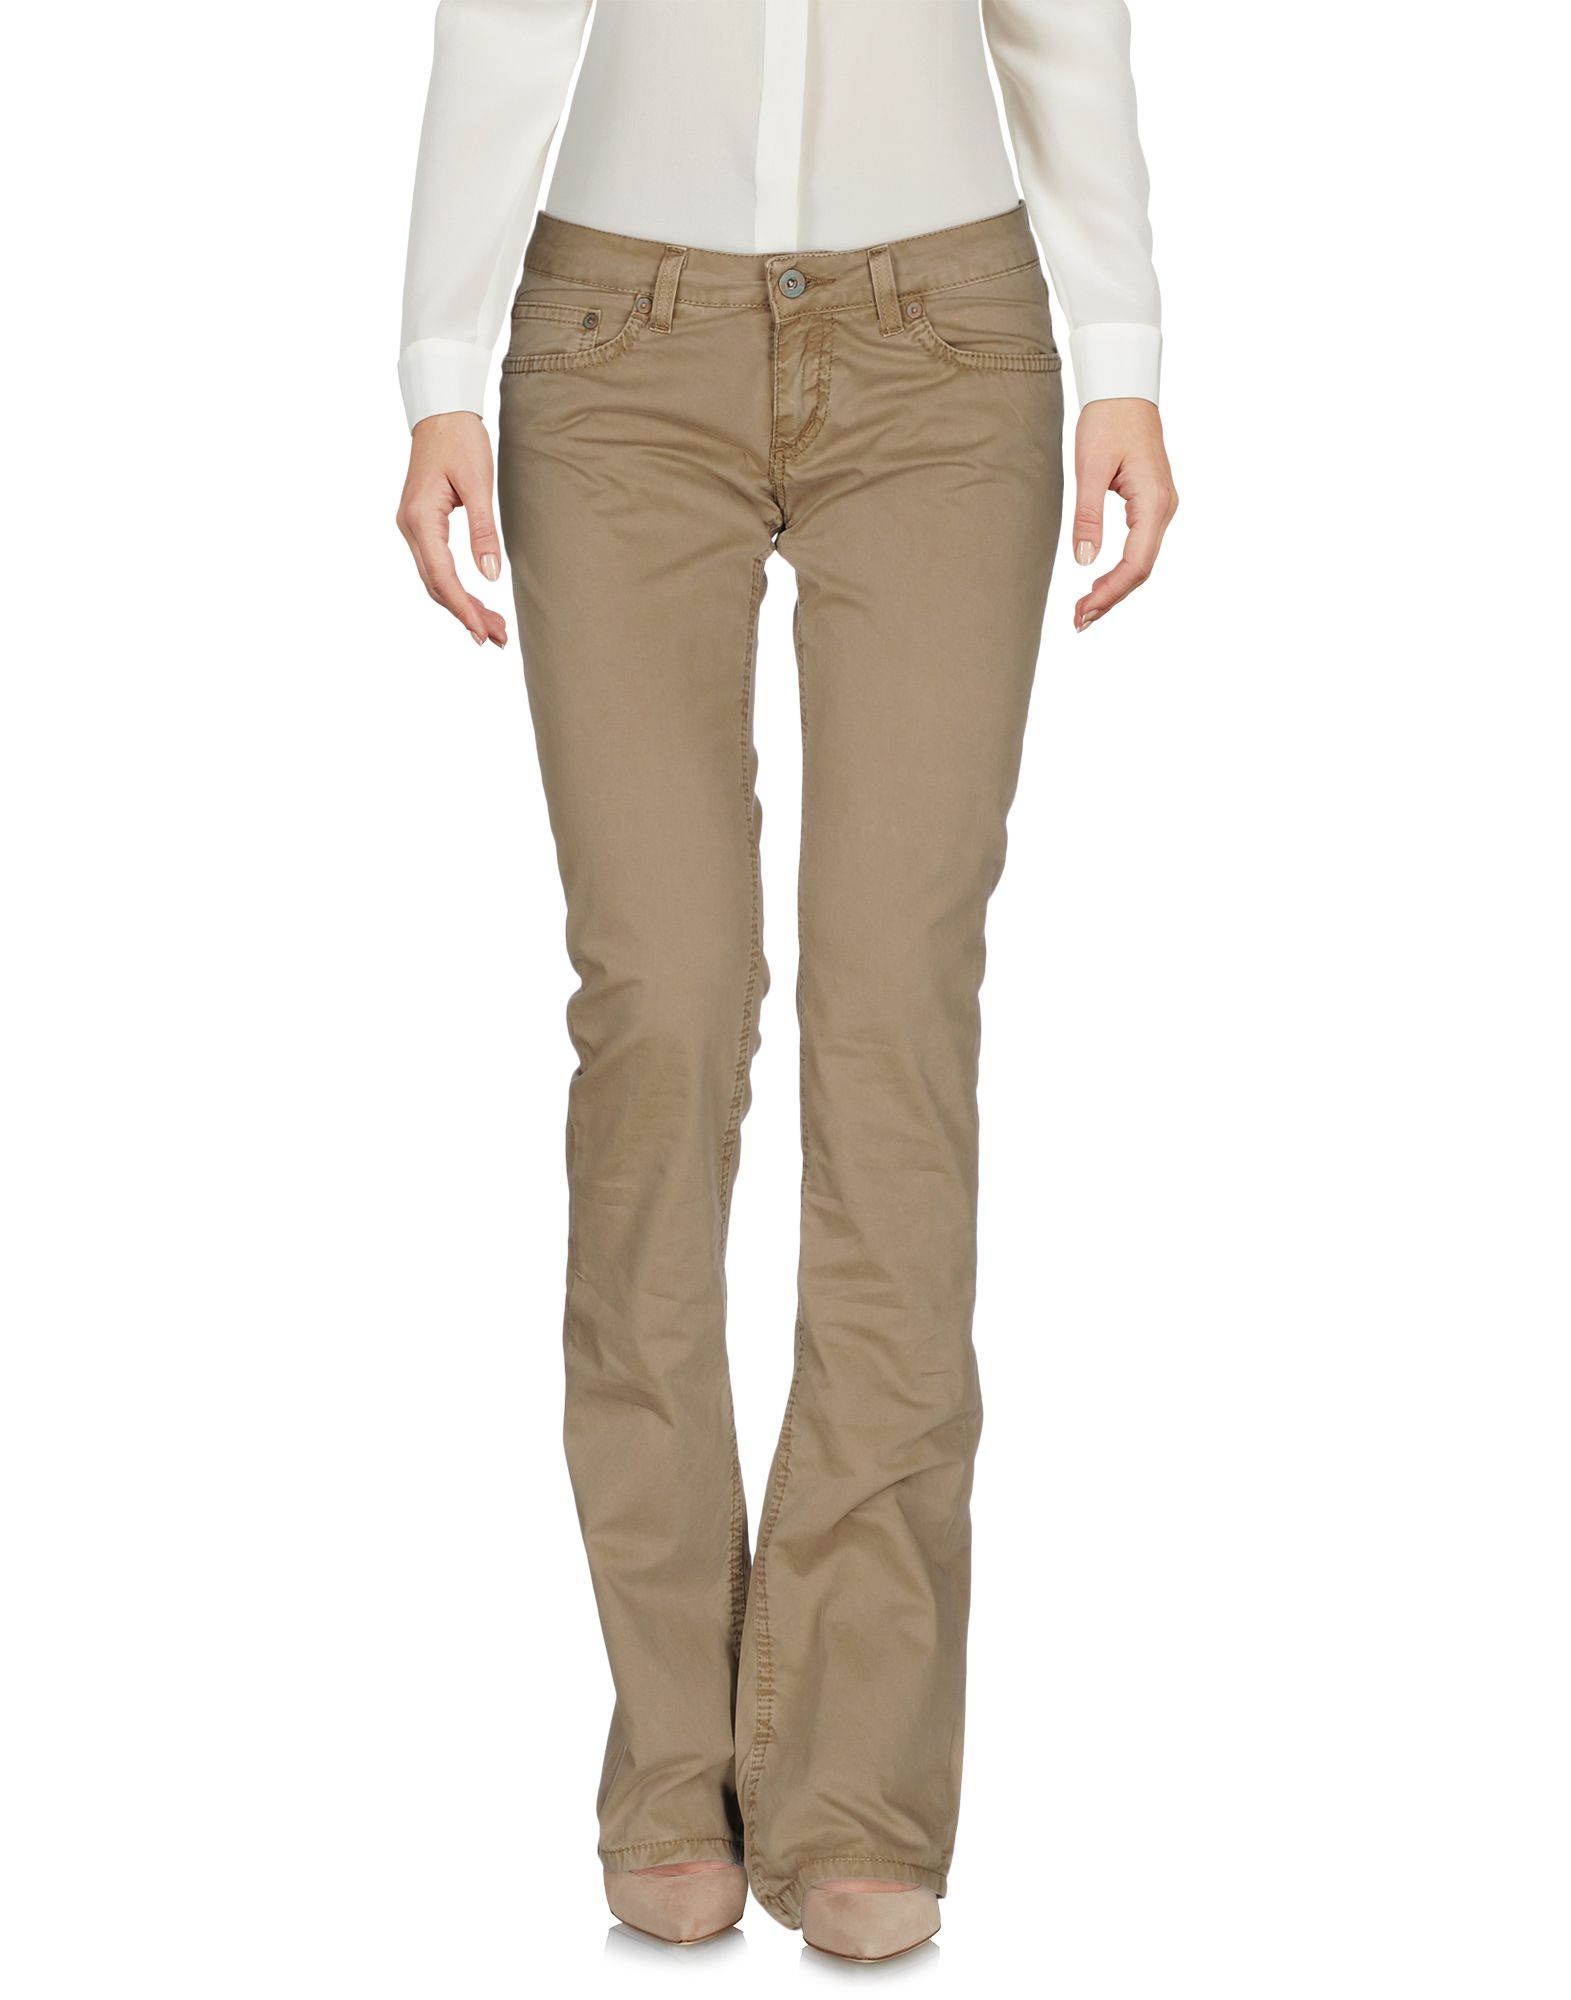 DONDUP STANDART Damen Hose Farbe Khaki Größe 4 - broschei